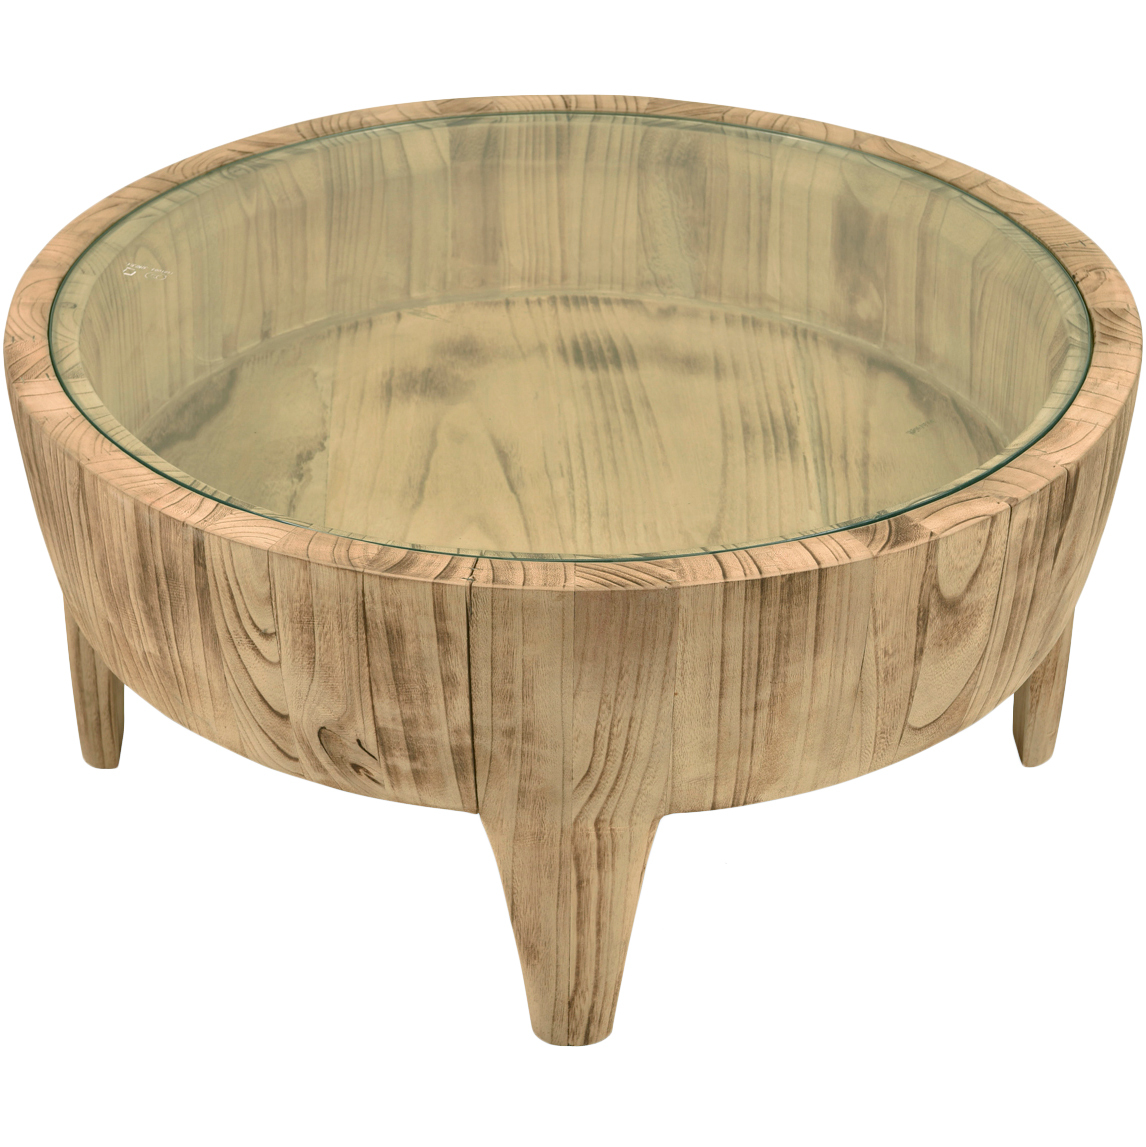 Jimboran Wooden Coffee Table Temple Webster